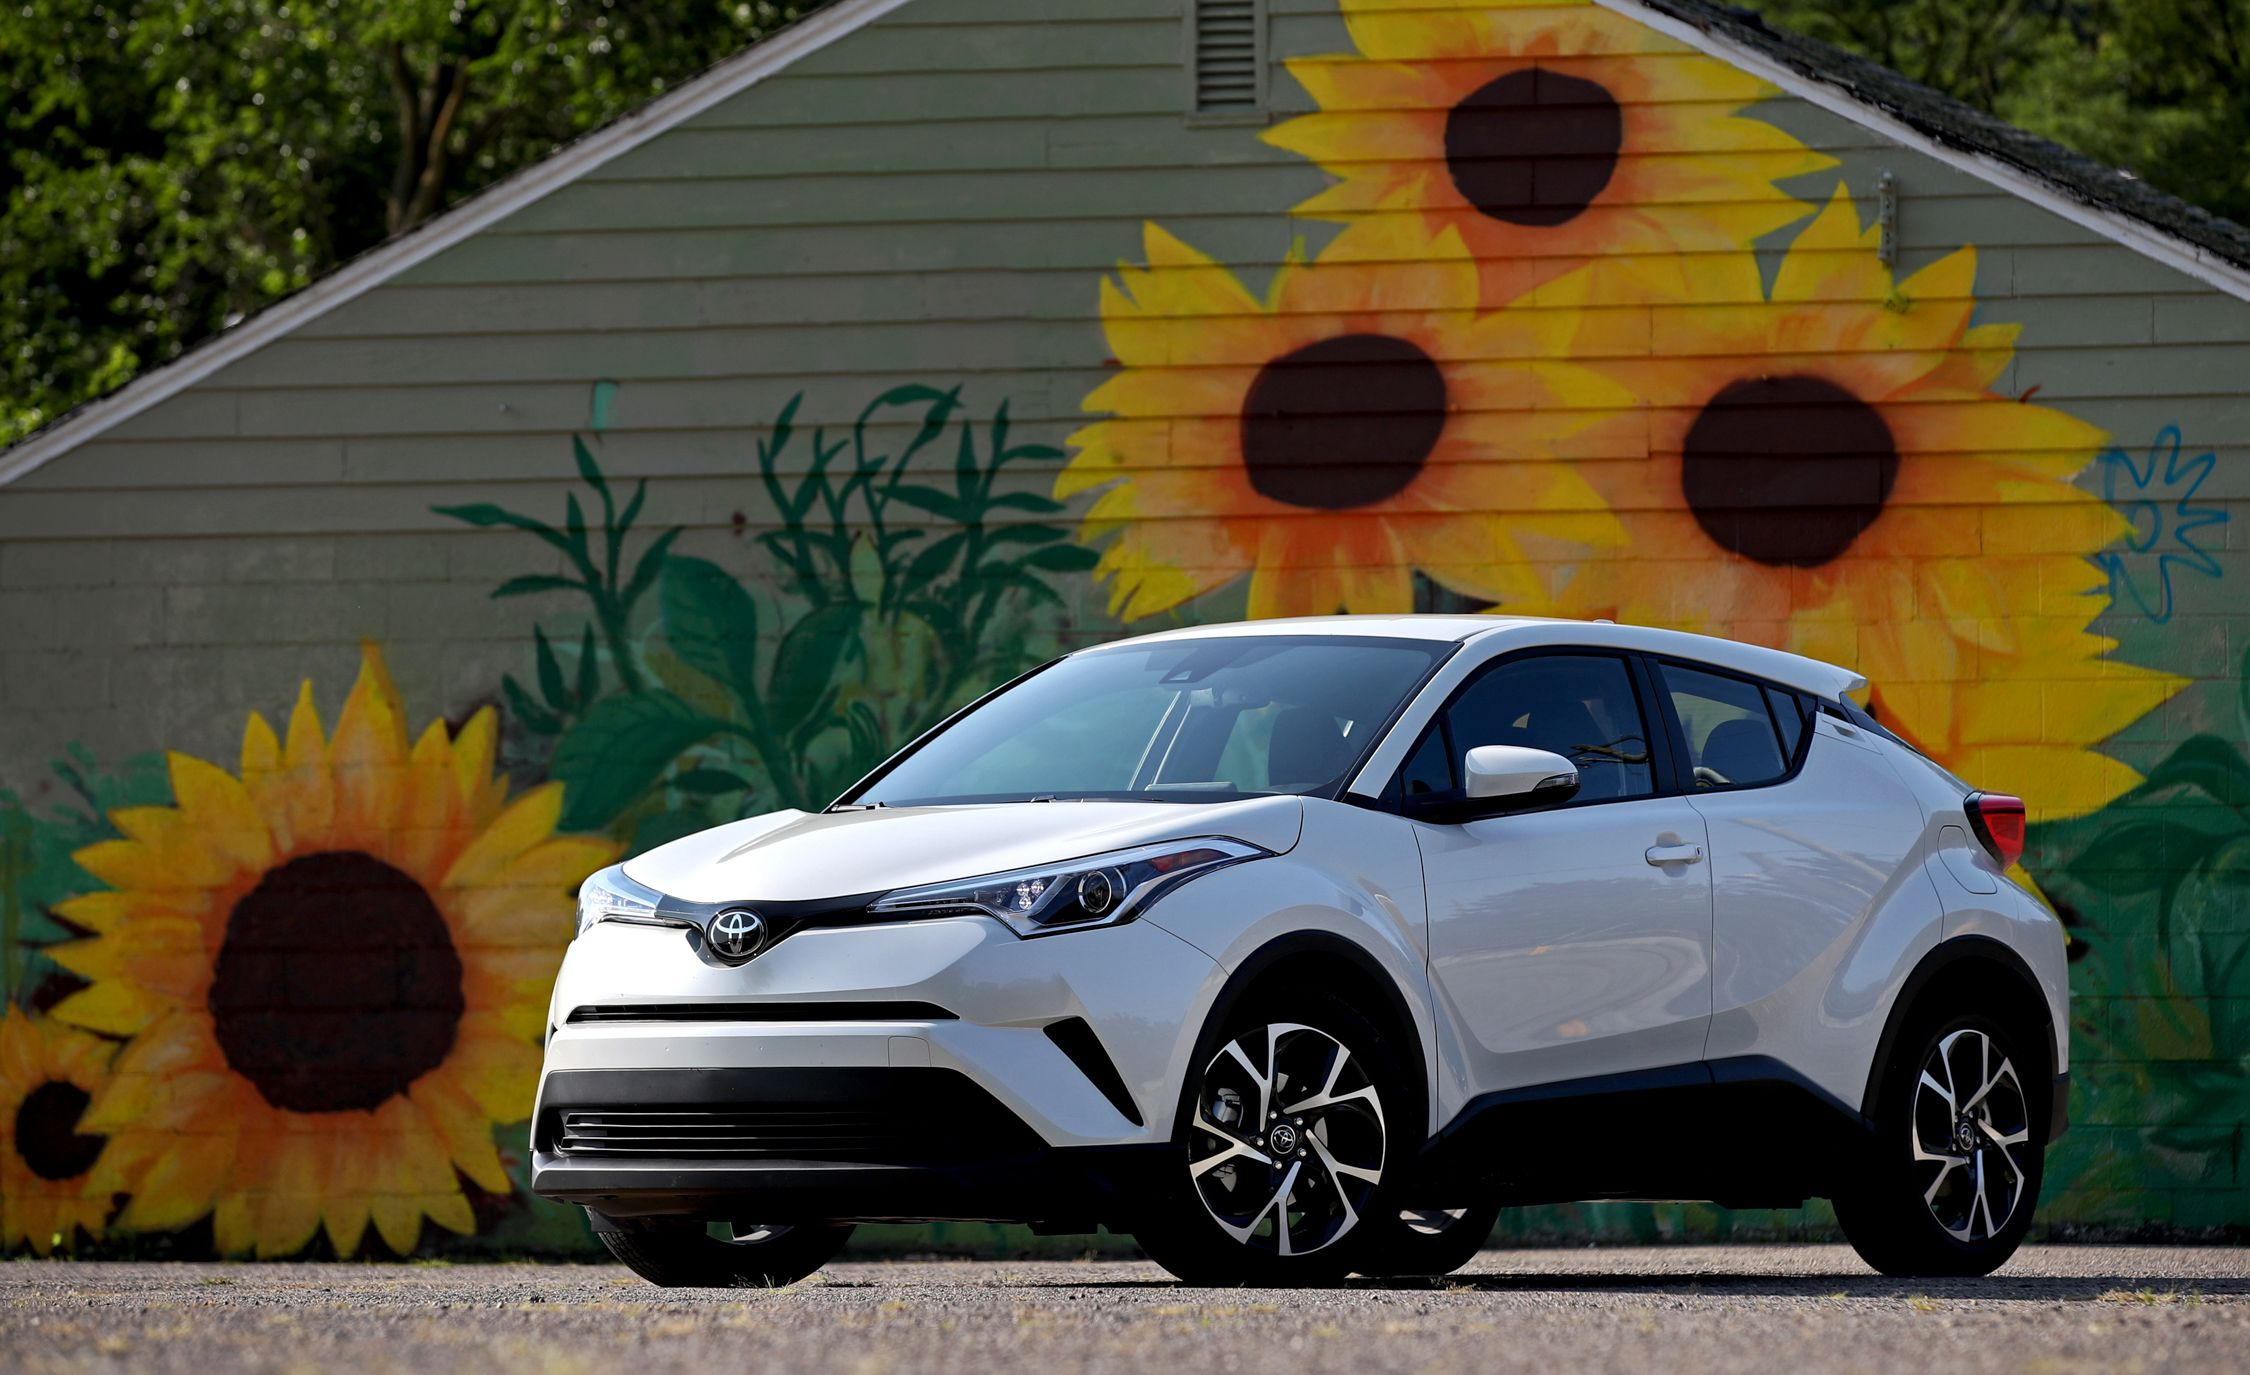 2019 Toyota C Hr Reviews Toyota C Hr Price Photos And Specs